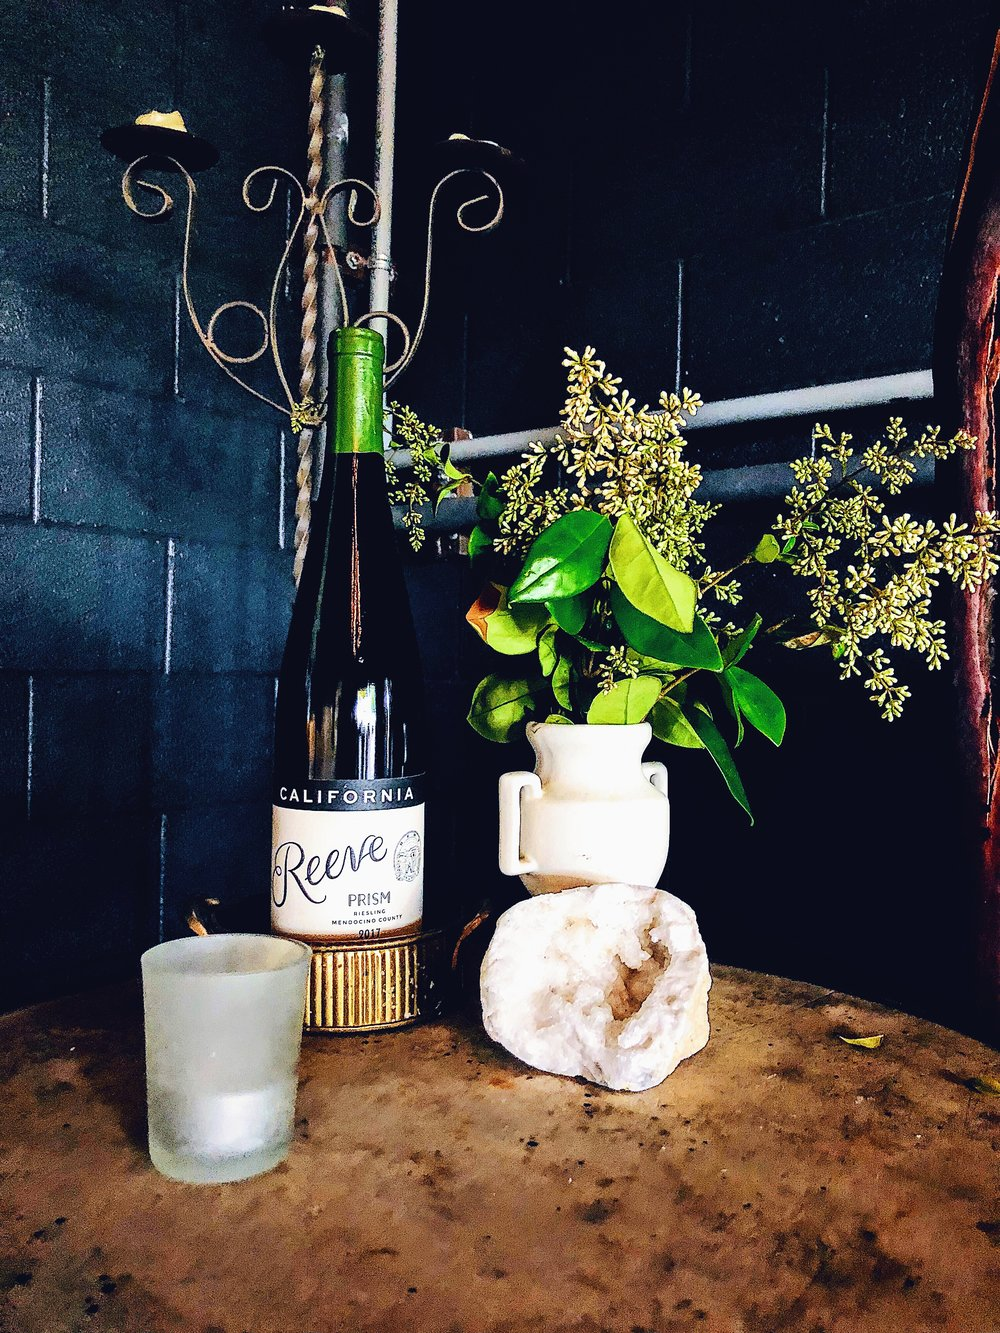 2017 Reeve Wines Mendocino County Prism Riesling